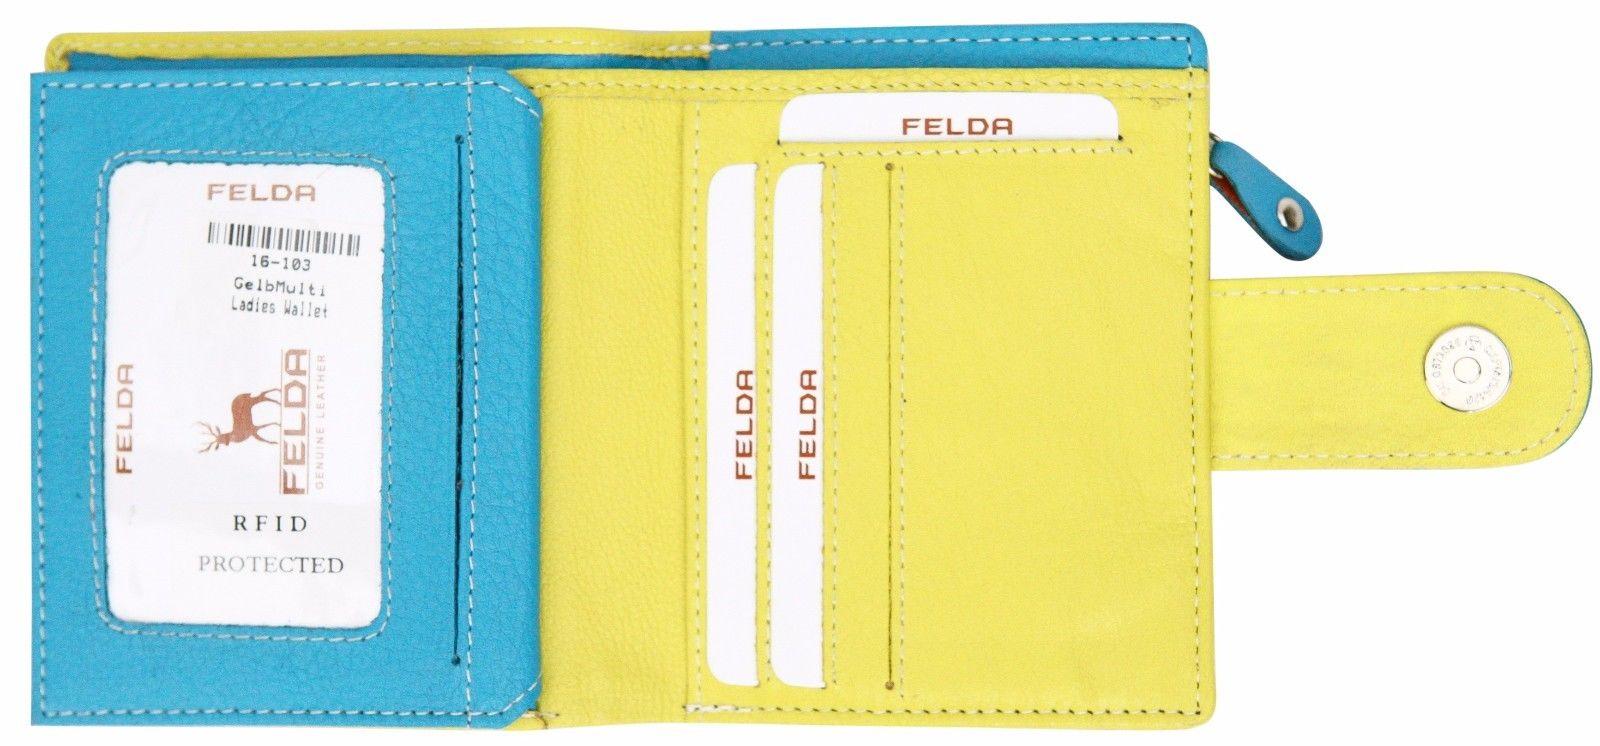 Felda-RFID-onorevoli-MEDAGLIA-amp-Card-Purse-Wallet-Genuine-Leather-Multi-SOFT-BOX-REGALO miniatura 32